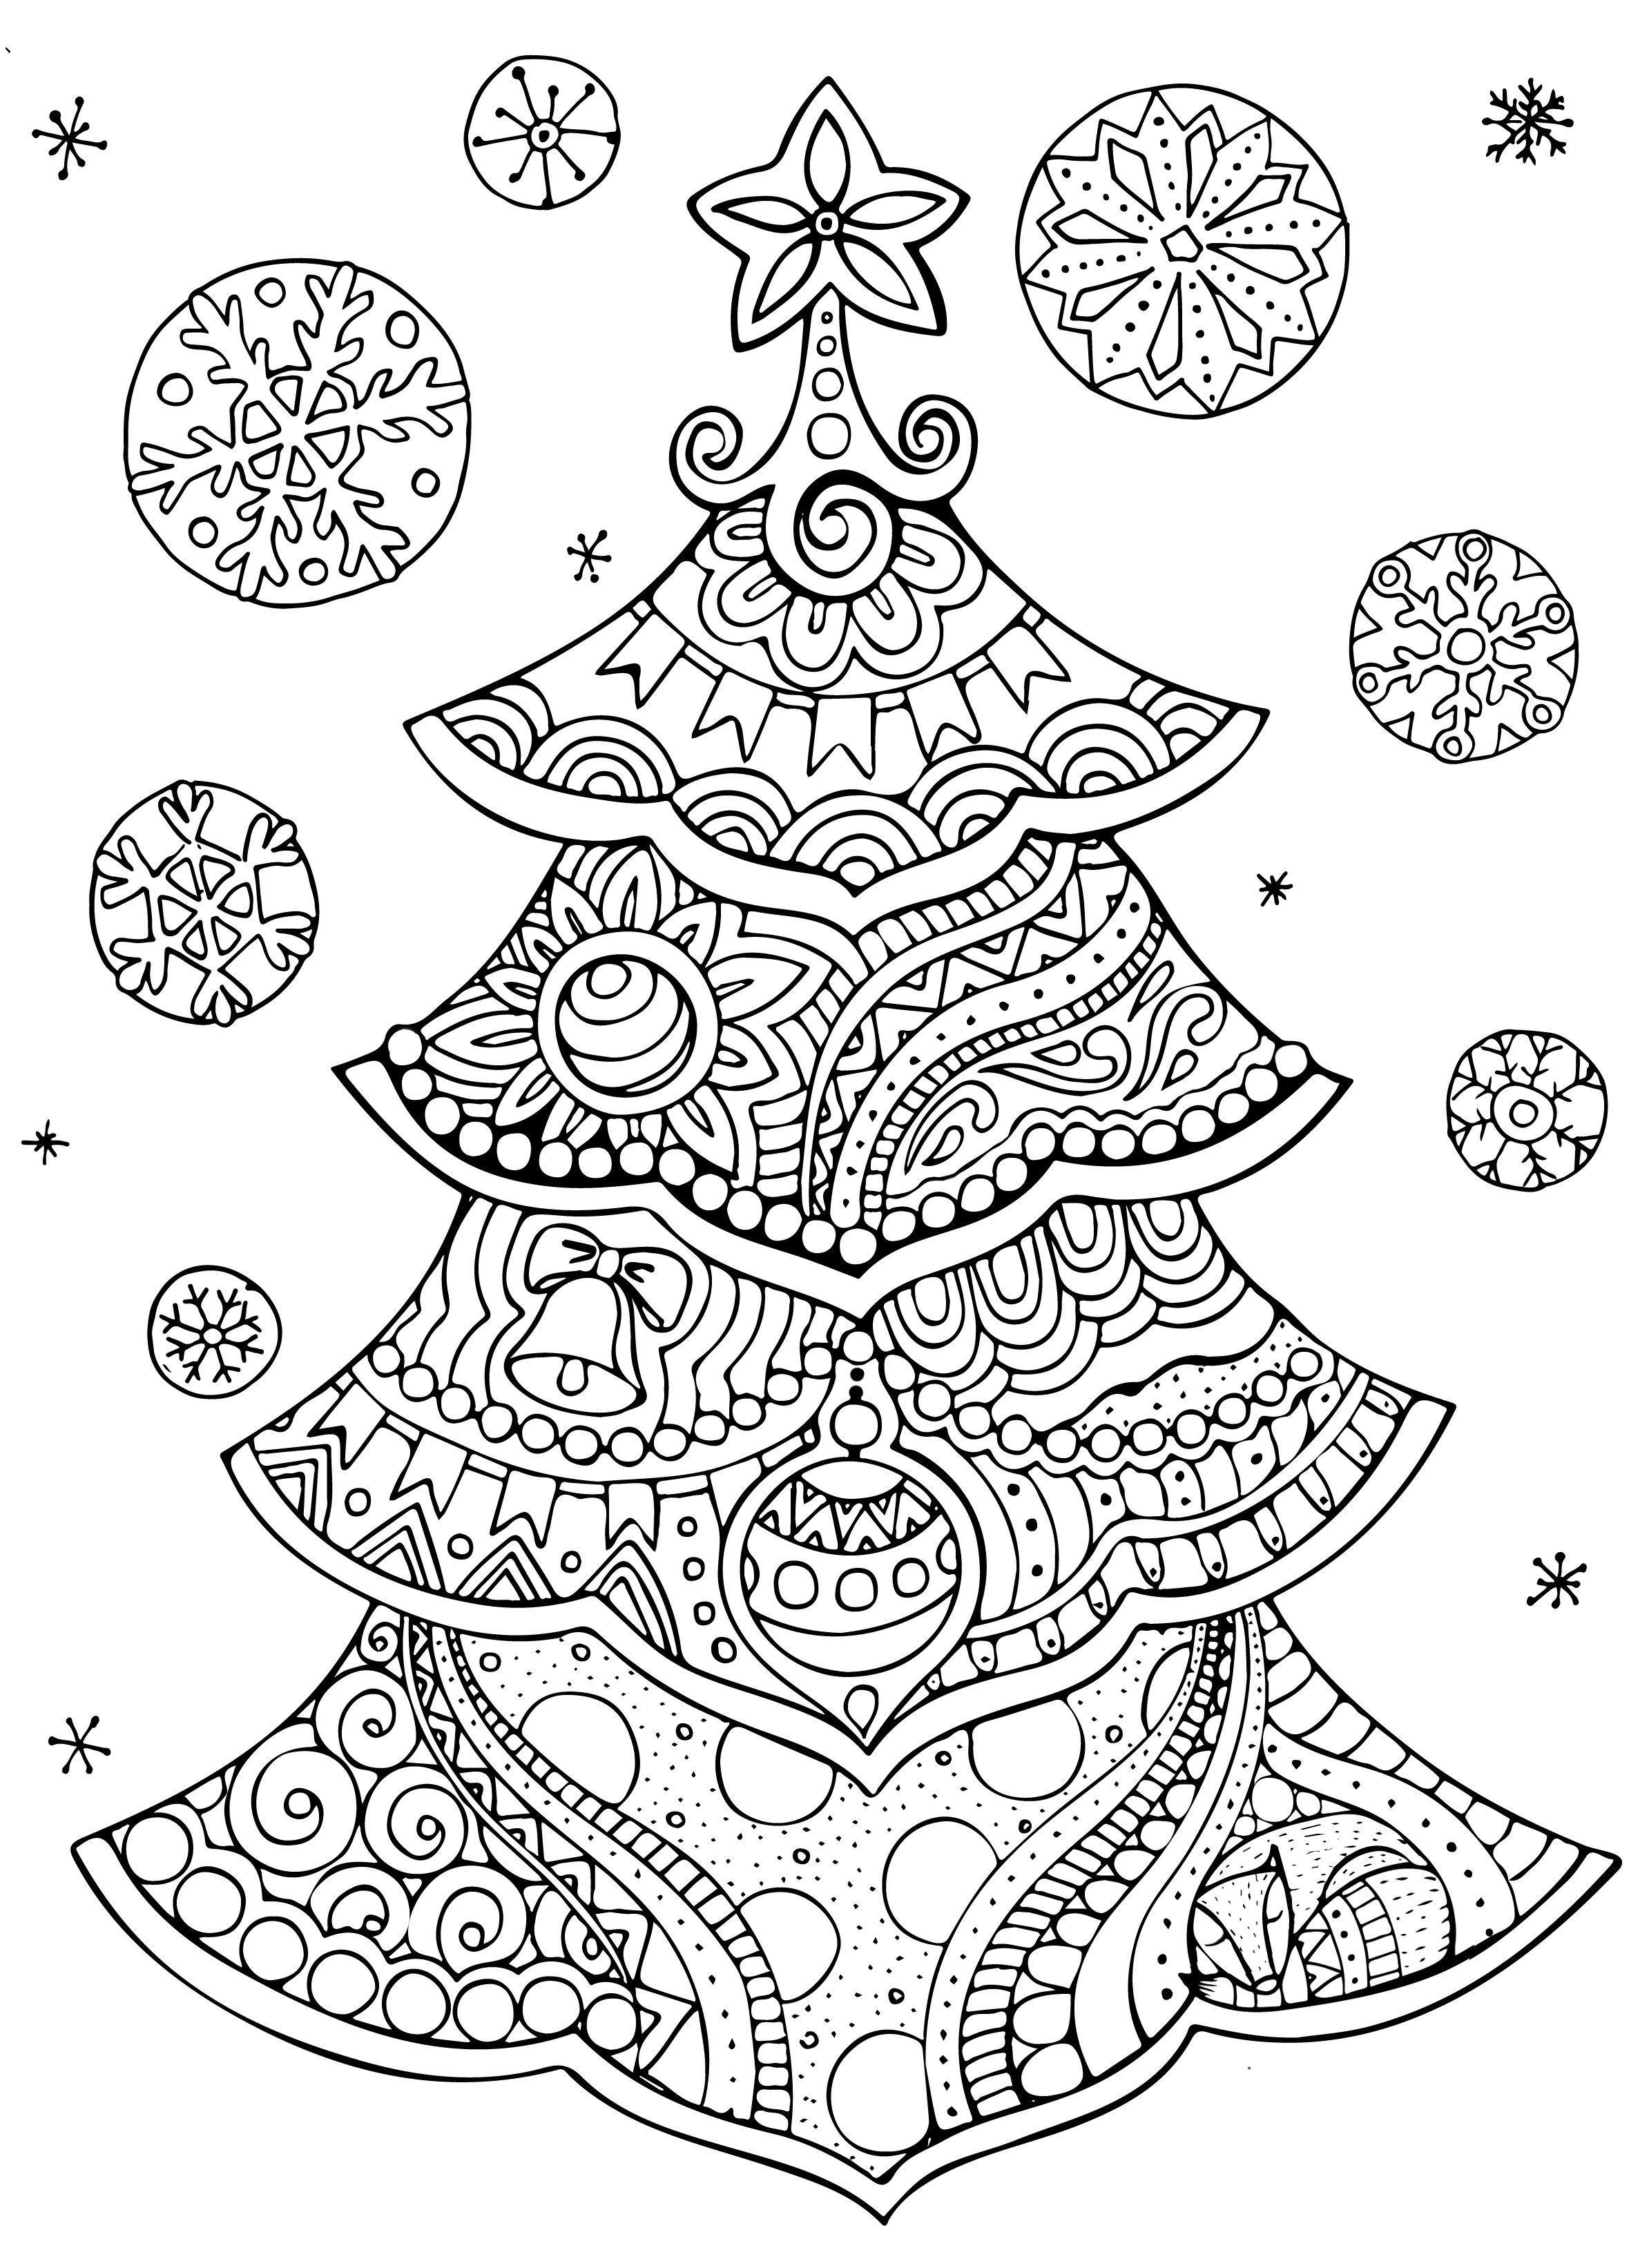 0d3b3a5b 5f71 4e66 900f 8e4641d85928jpg 2388 3285 Christmas Coloring Pages Printable Christmas Coloring Pages Christmas Coloring Books